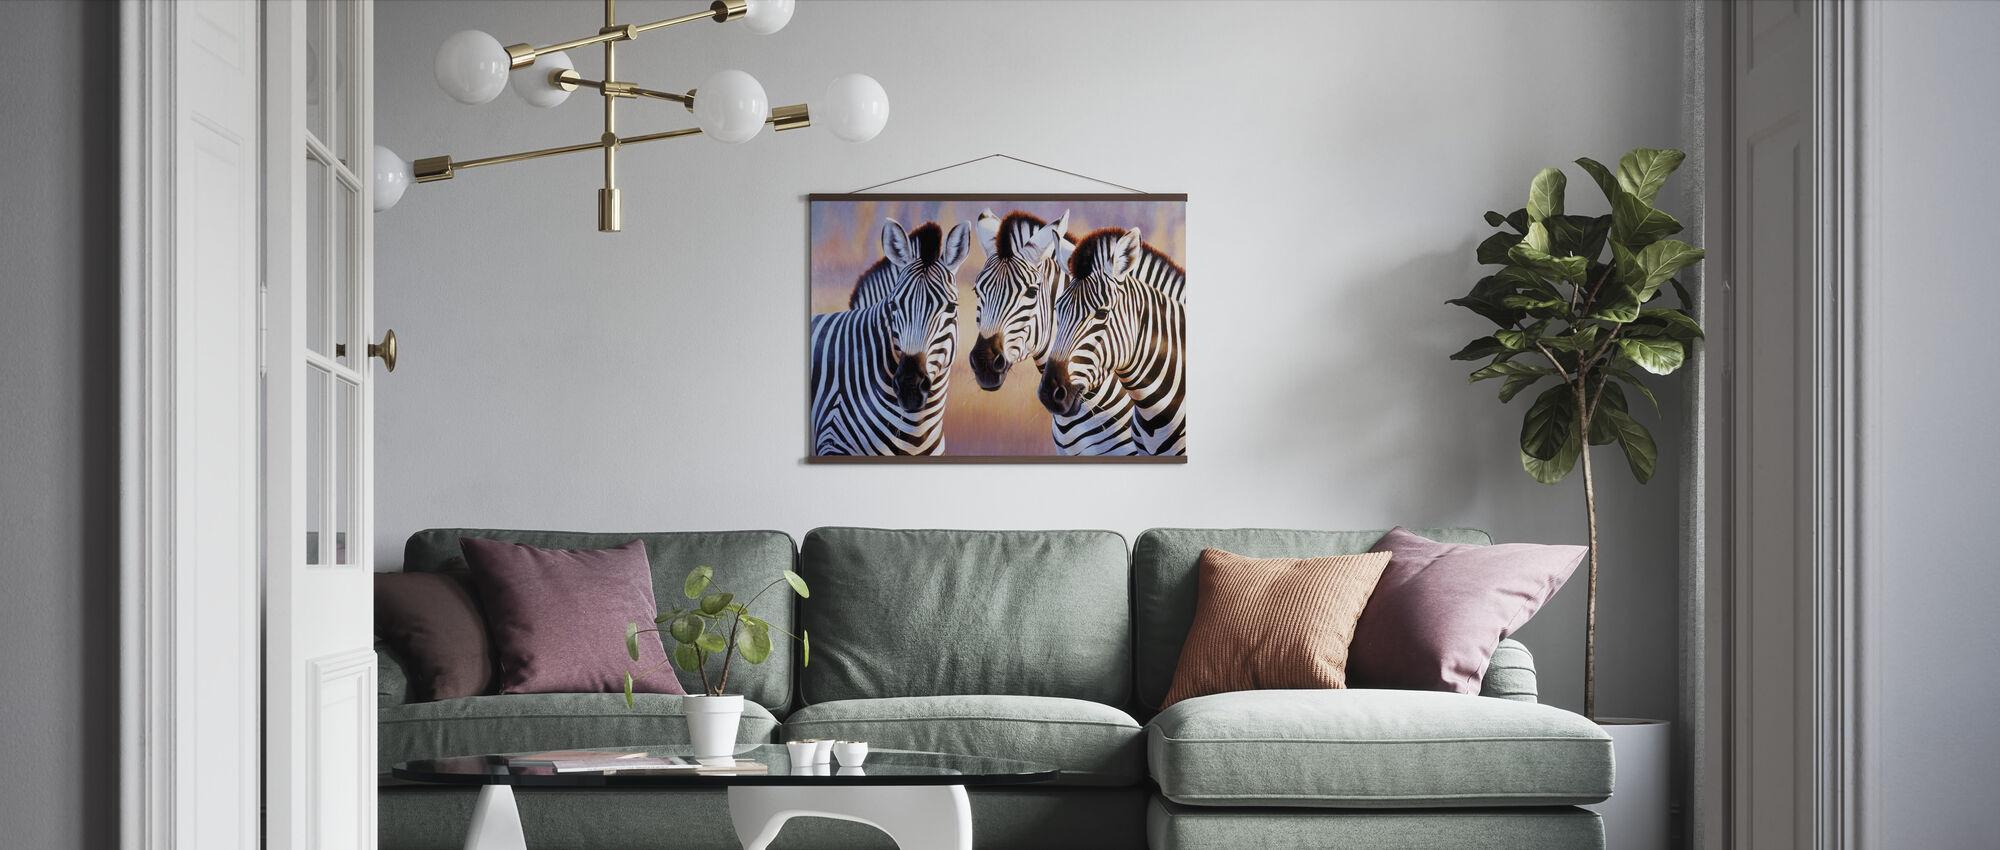 Stora Zebra huvuden - Poster - Vardagsrum